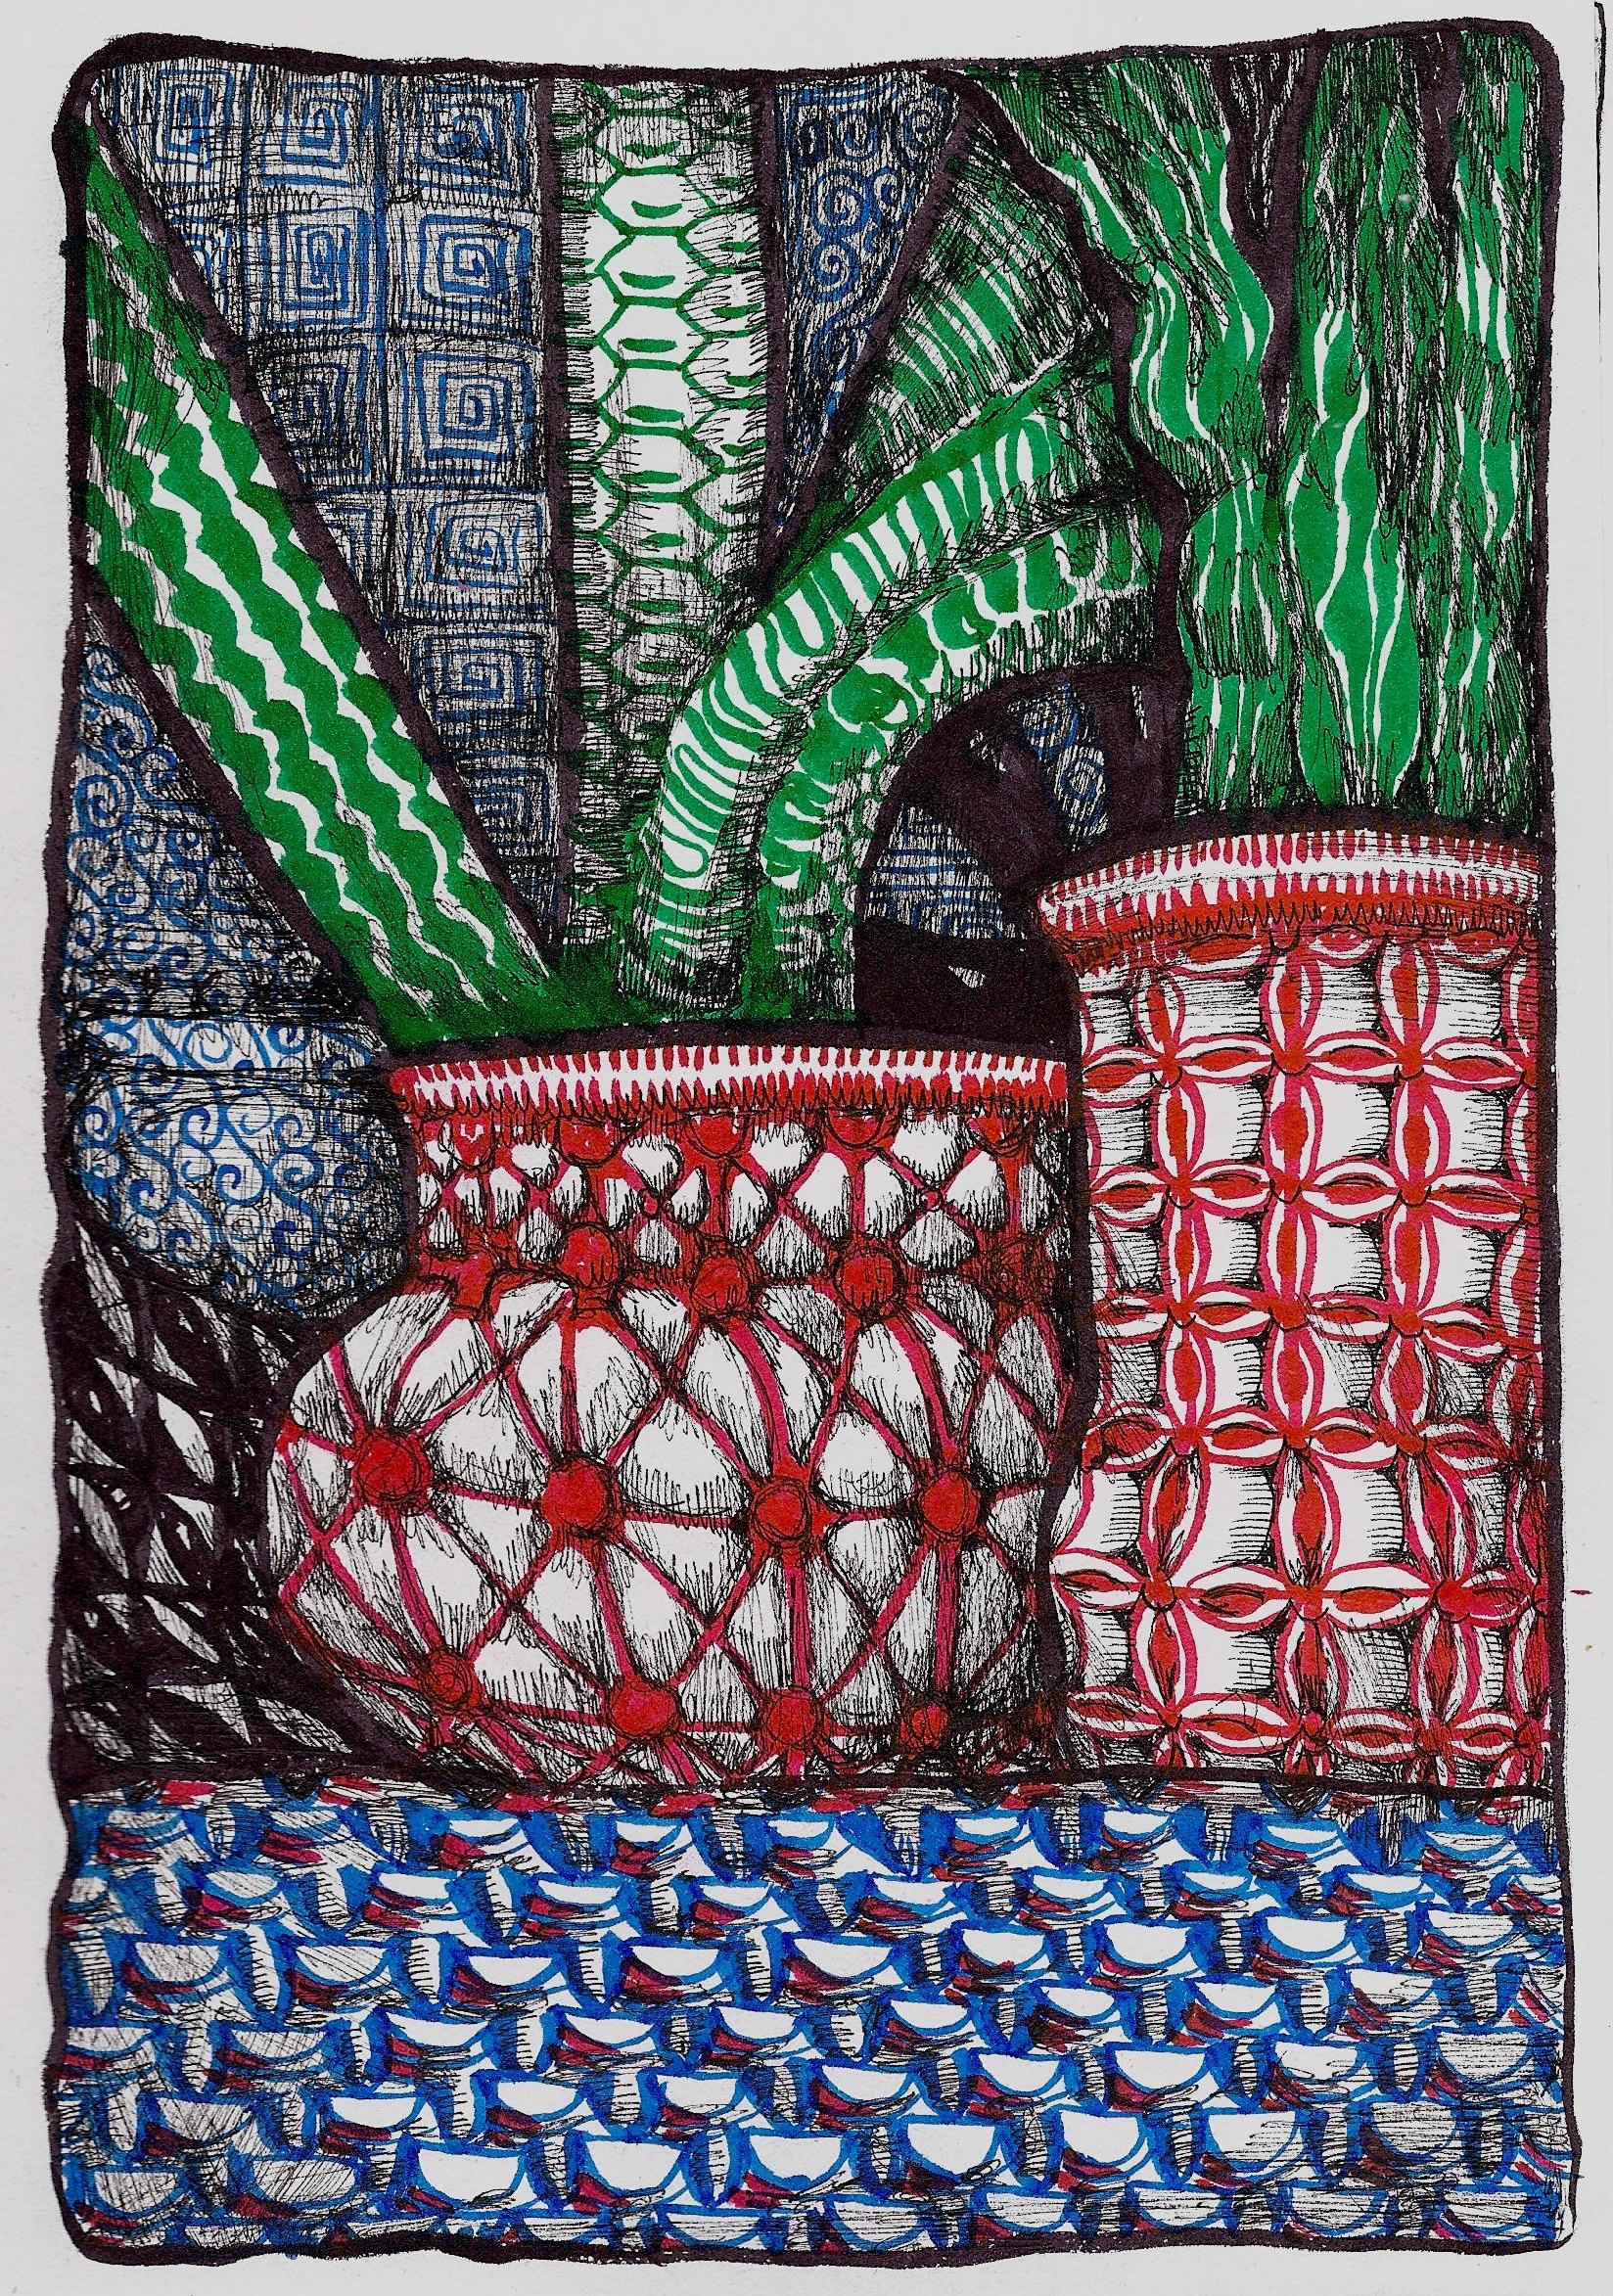 <b>Potted Cacti</b>